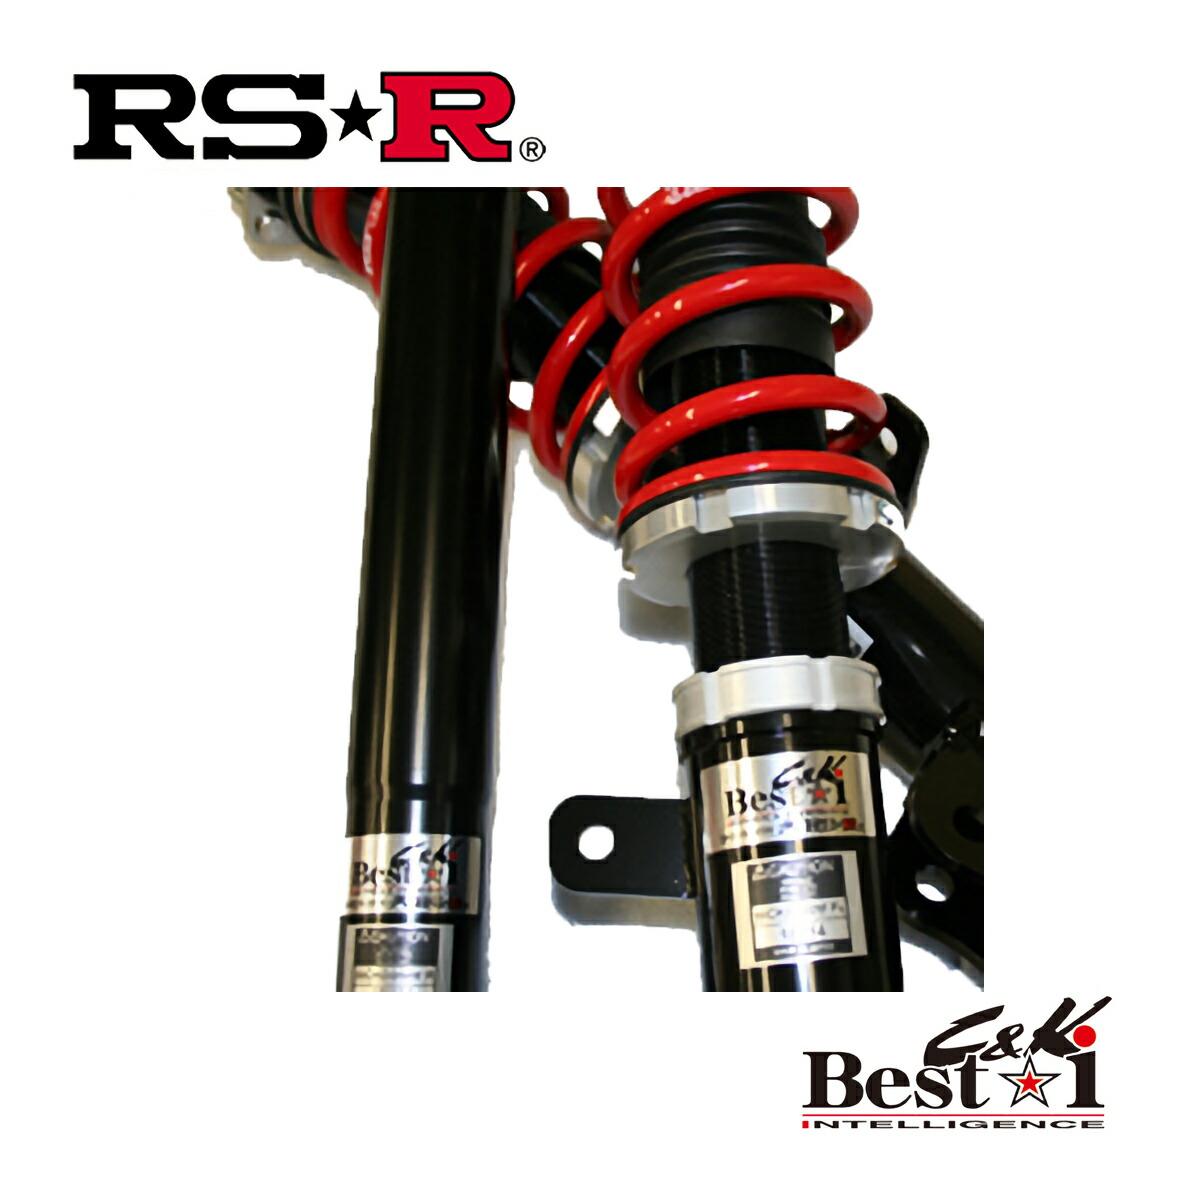 RS-R シフォン LA650F カスタムRS スマートアシスト 車高調 リア車高調整: ネジ式 BICKD401M ベストi C&K RSR 個人宅発送追金有